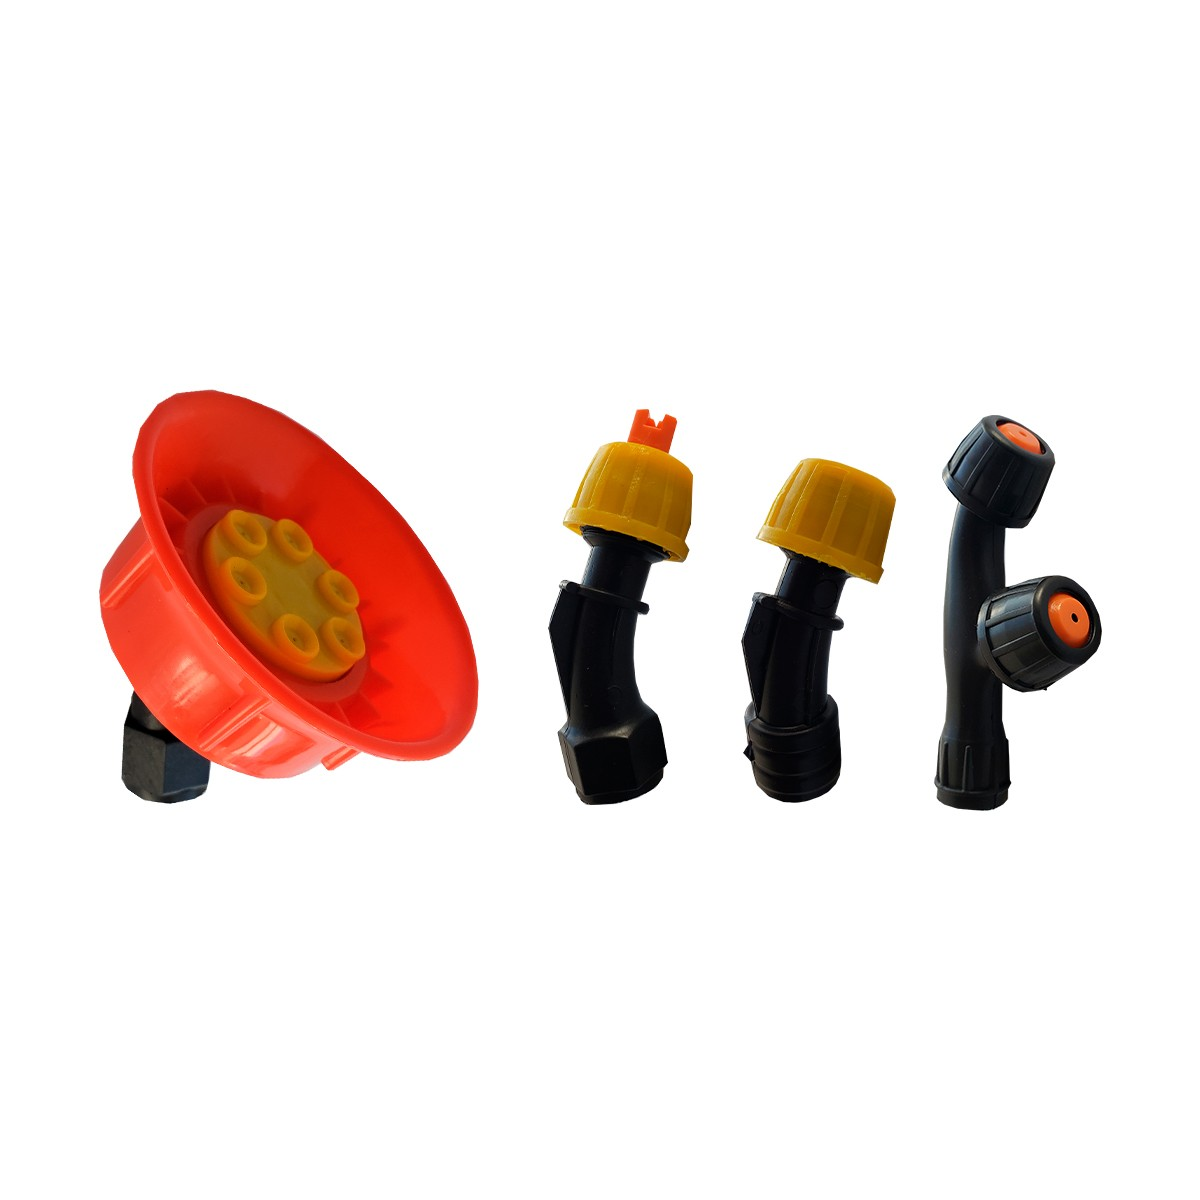 Kit De Reparo De Pulverizador 16 Litros Com todos os Bicos